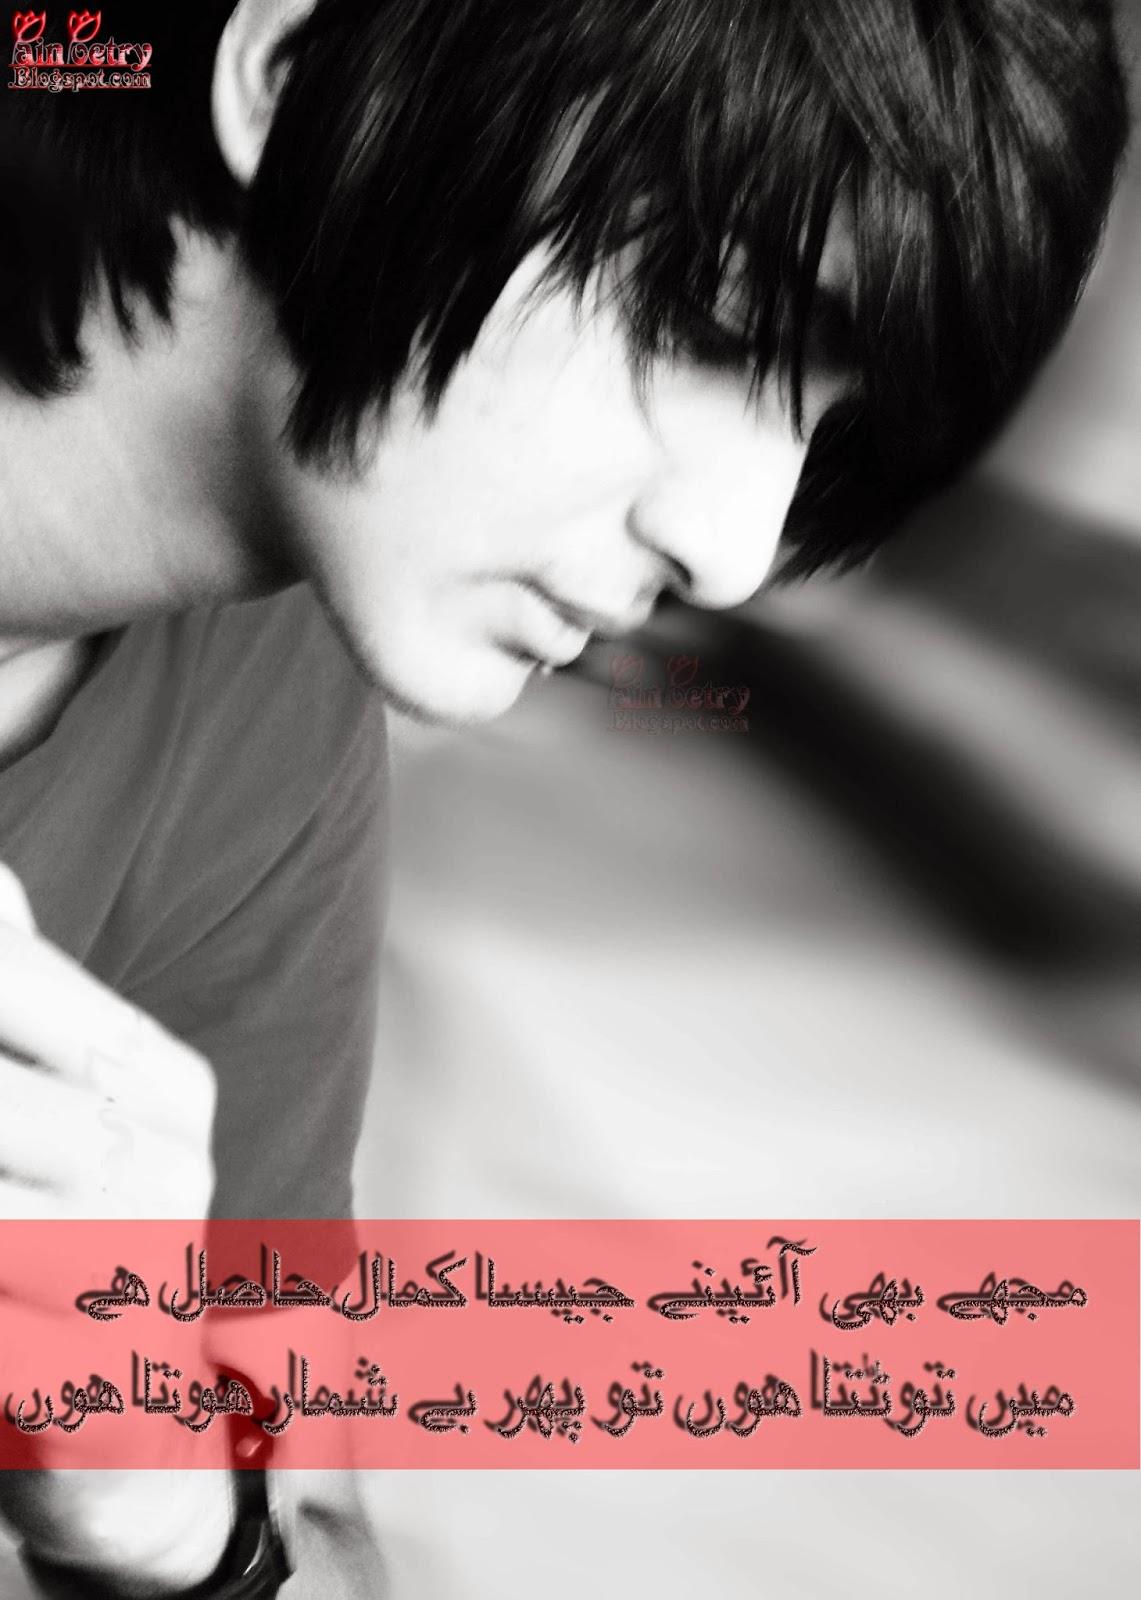 Boy-In-Love-Poetry-Mujhy-Bhi-Aainy-Jaisa-Kamal-Hasil-Hy-Mein-Tutta-Hun-To-Phir-Bey-Shumar-Hota-Hun-Image-HD-Wide